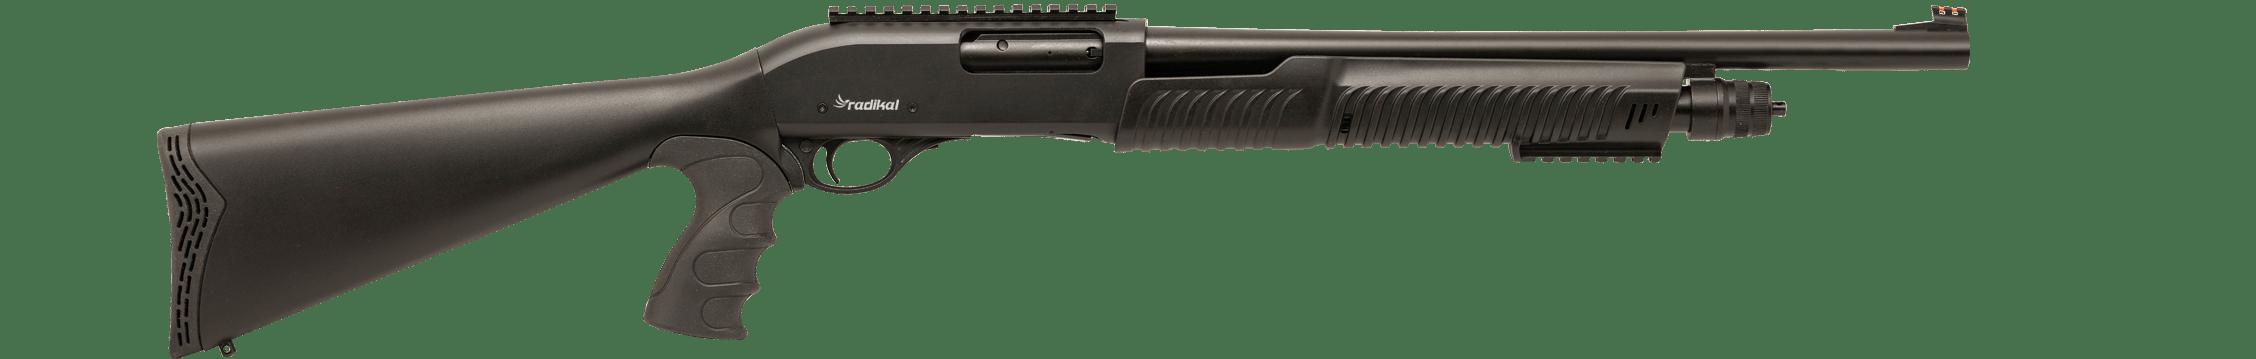 Radikal Arms P-3, 12Ga. Tactical Pump-Action Shotgun, Black (P3)